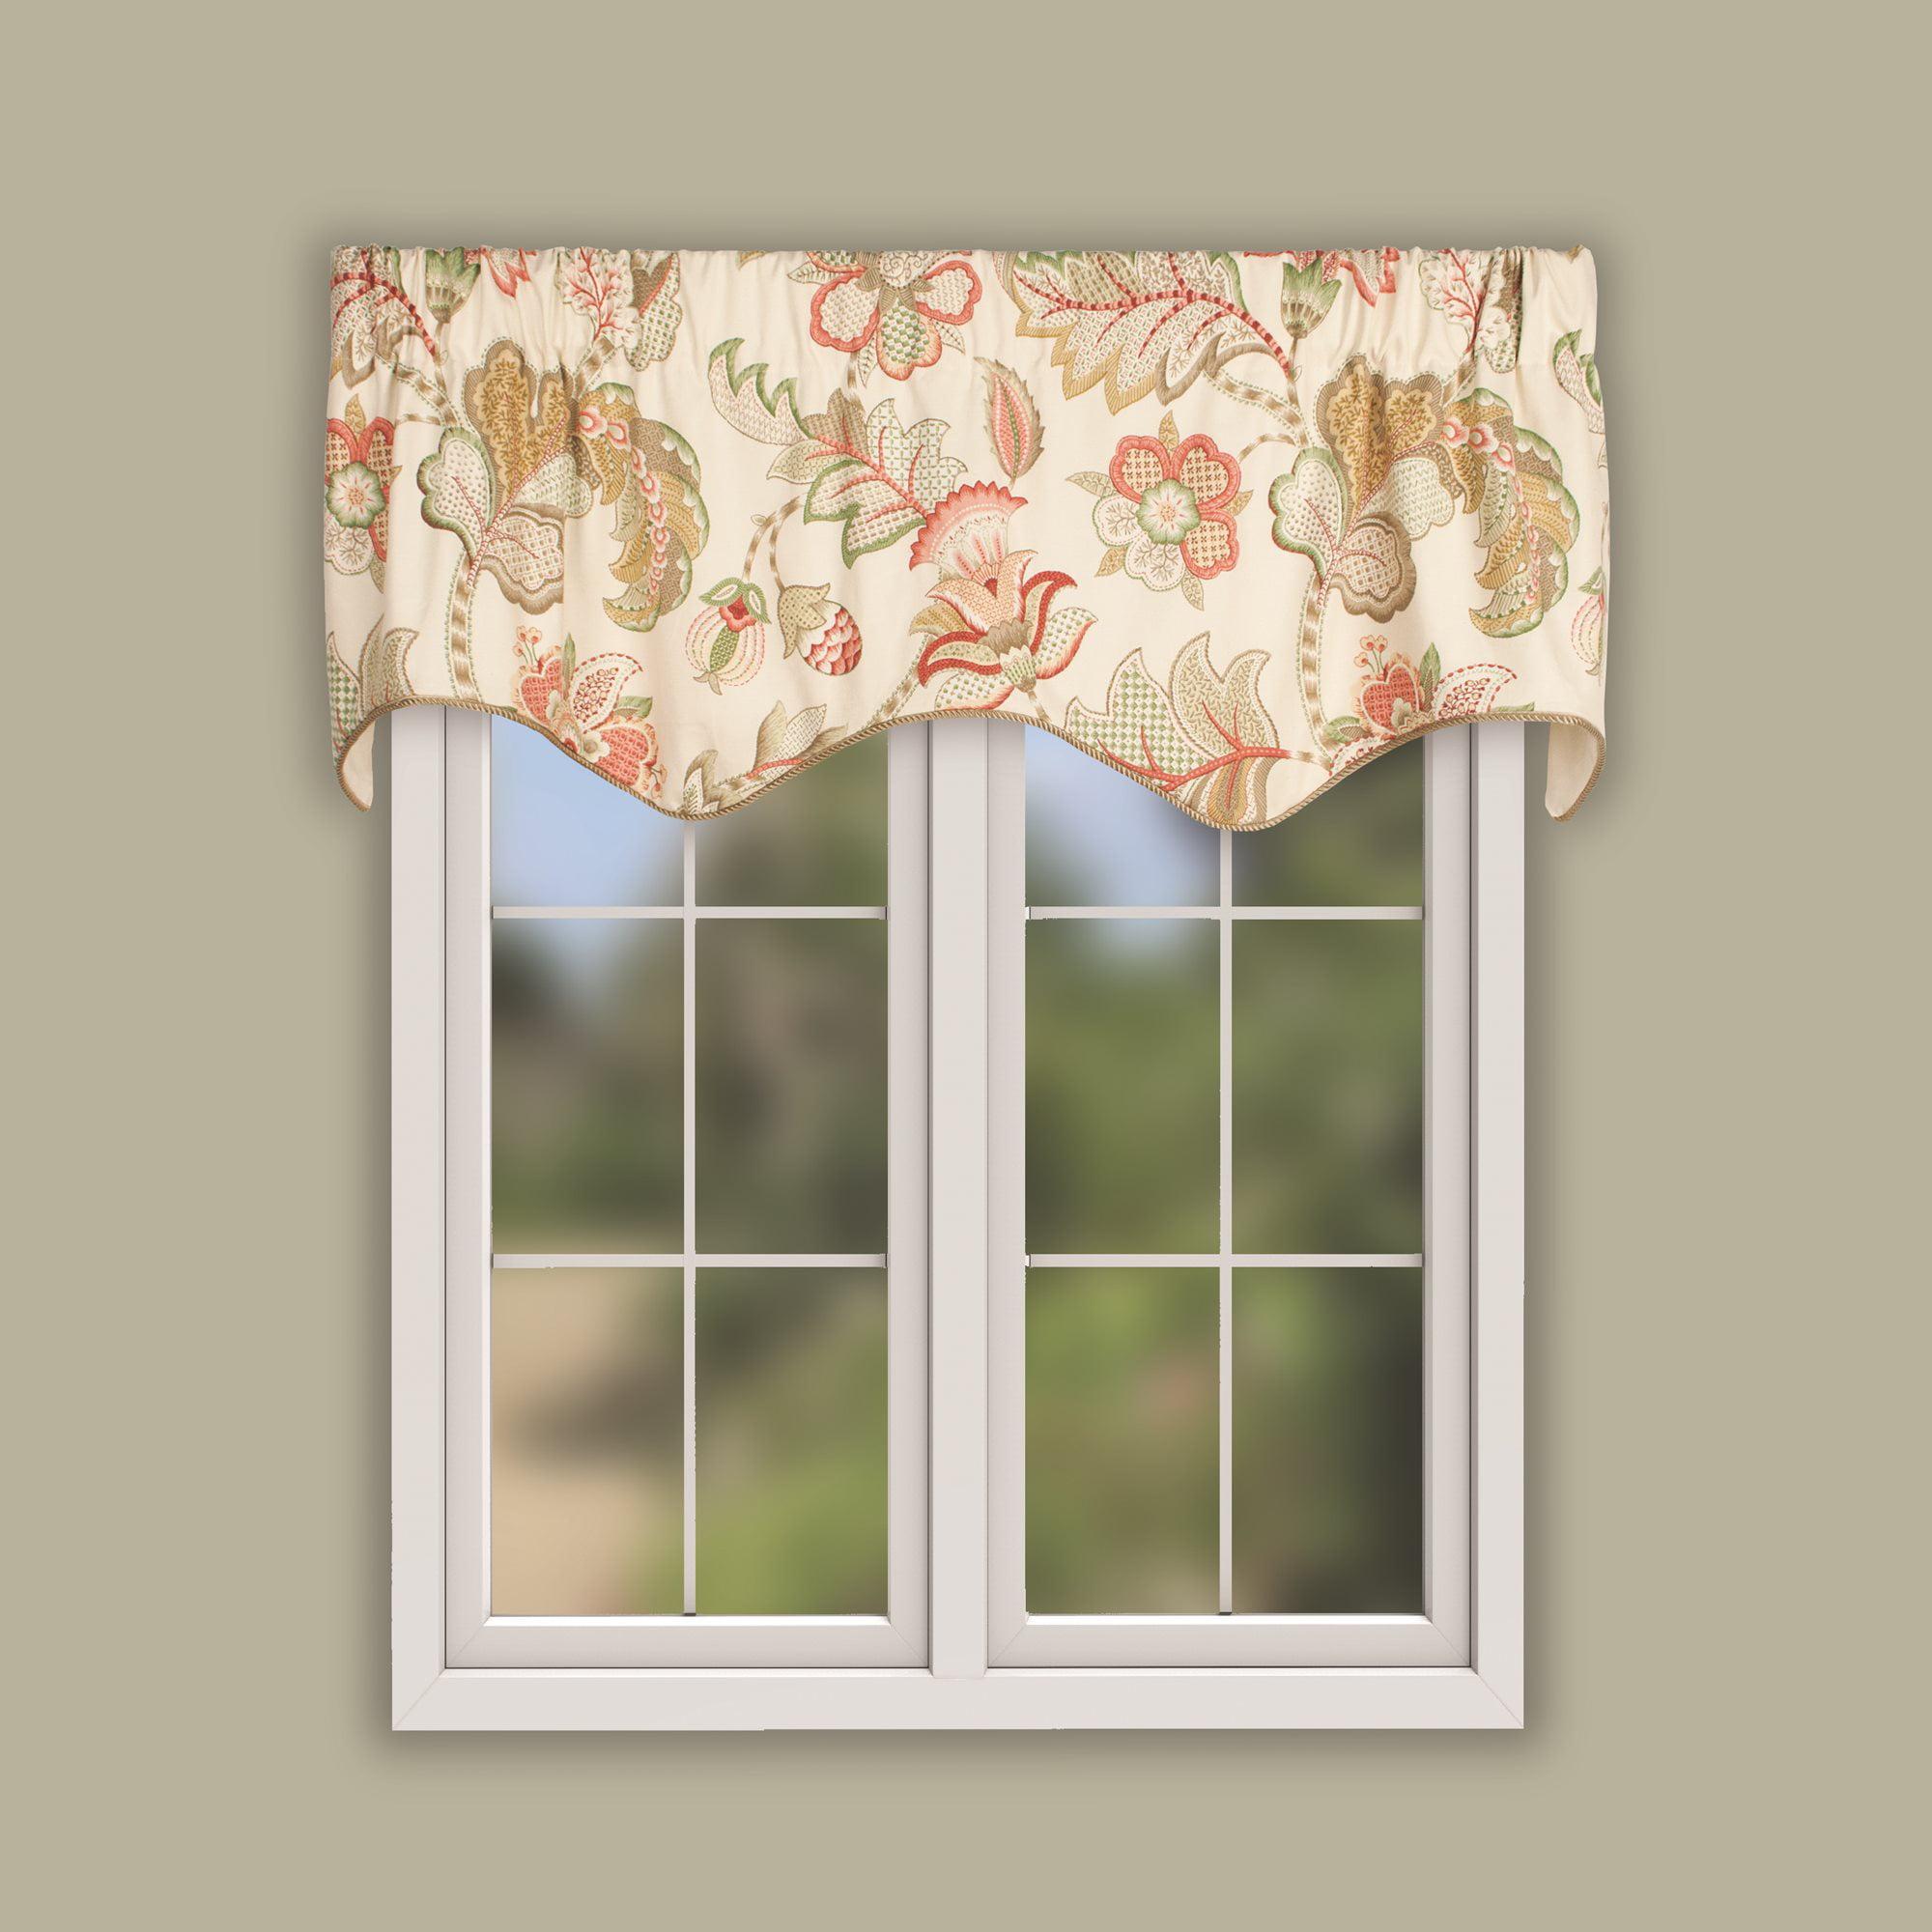 window valance Lined scalloped window valance decorative valance scallop style window curtain